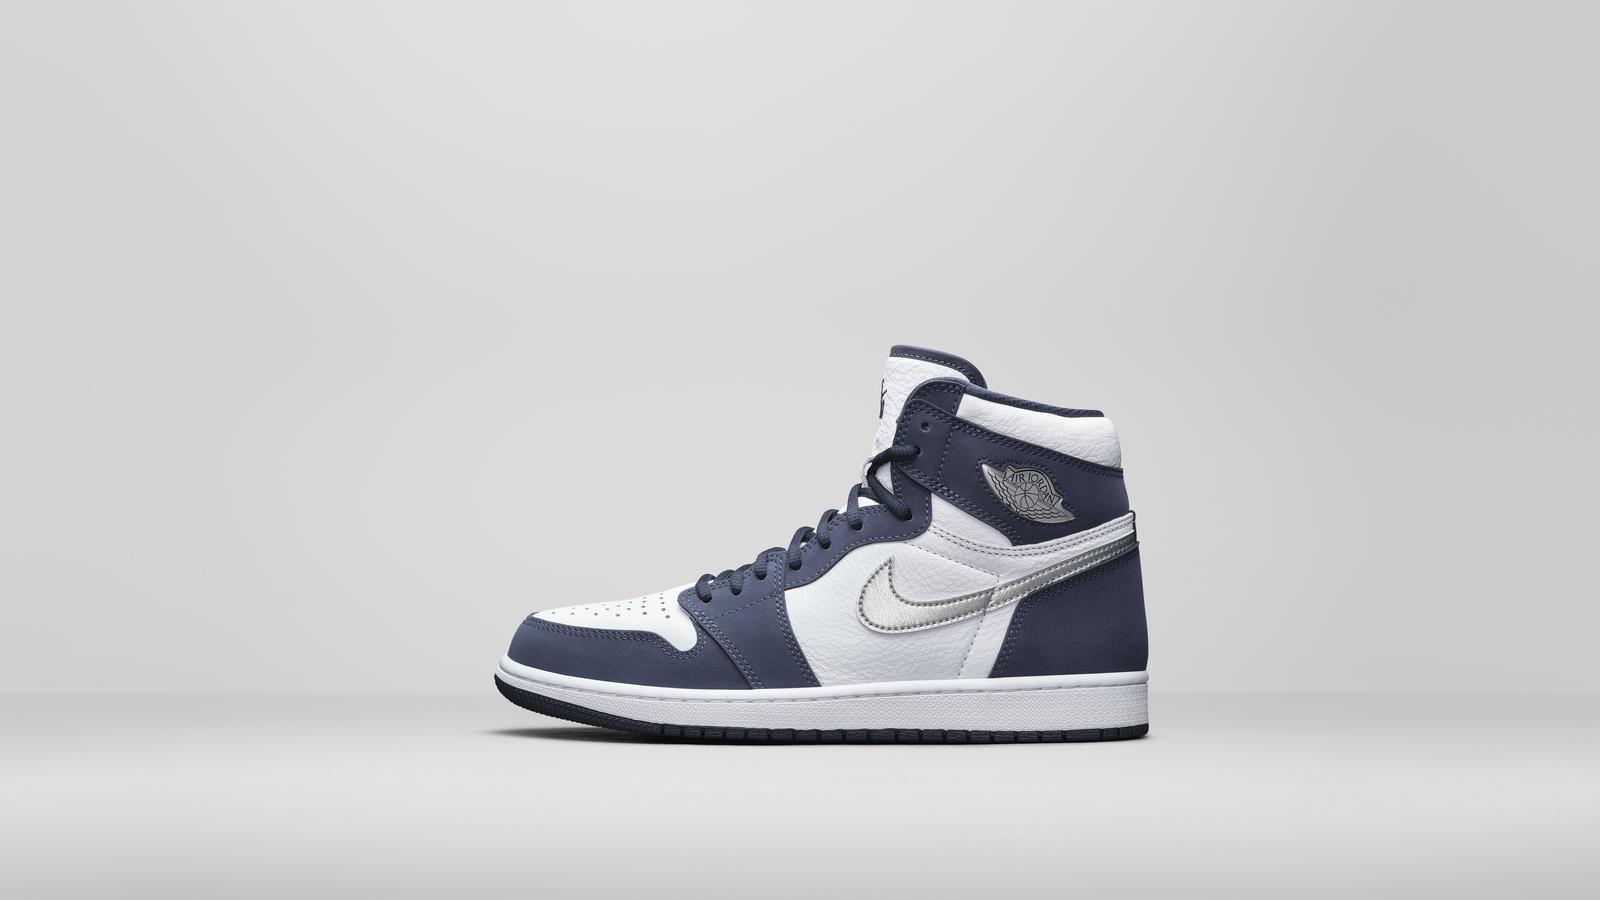 Jordan Brand Holiday 2020 Retro